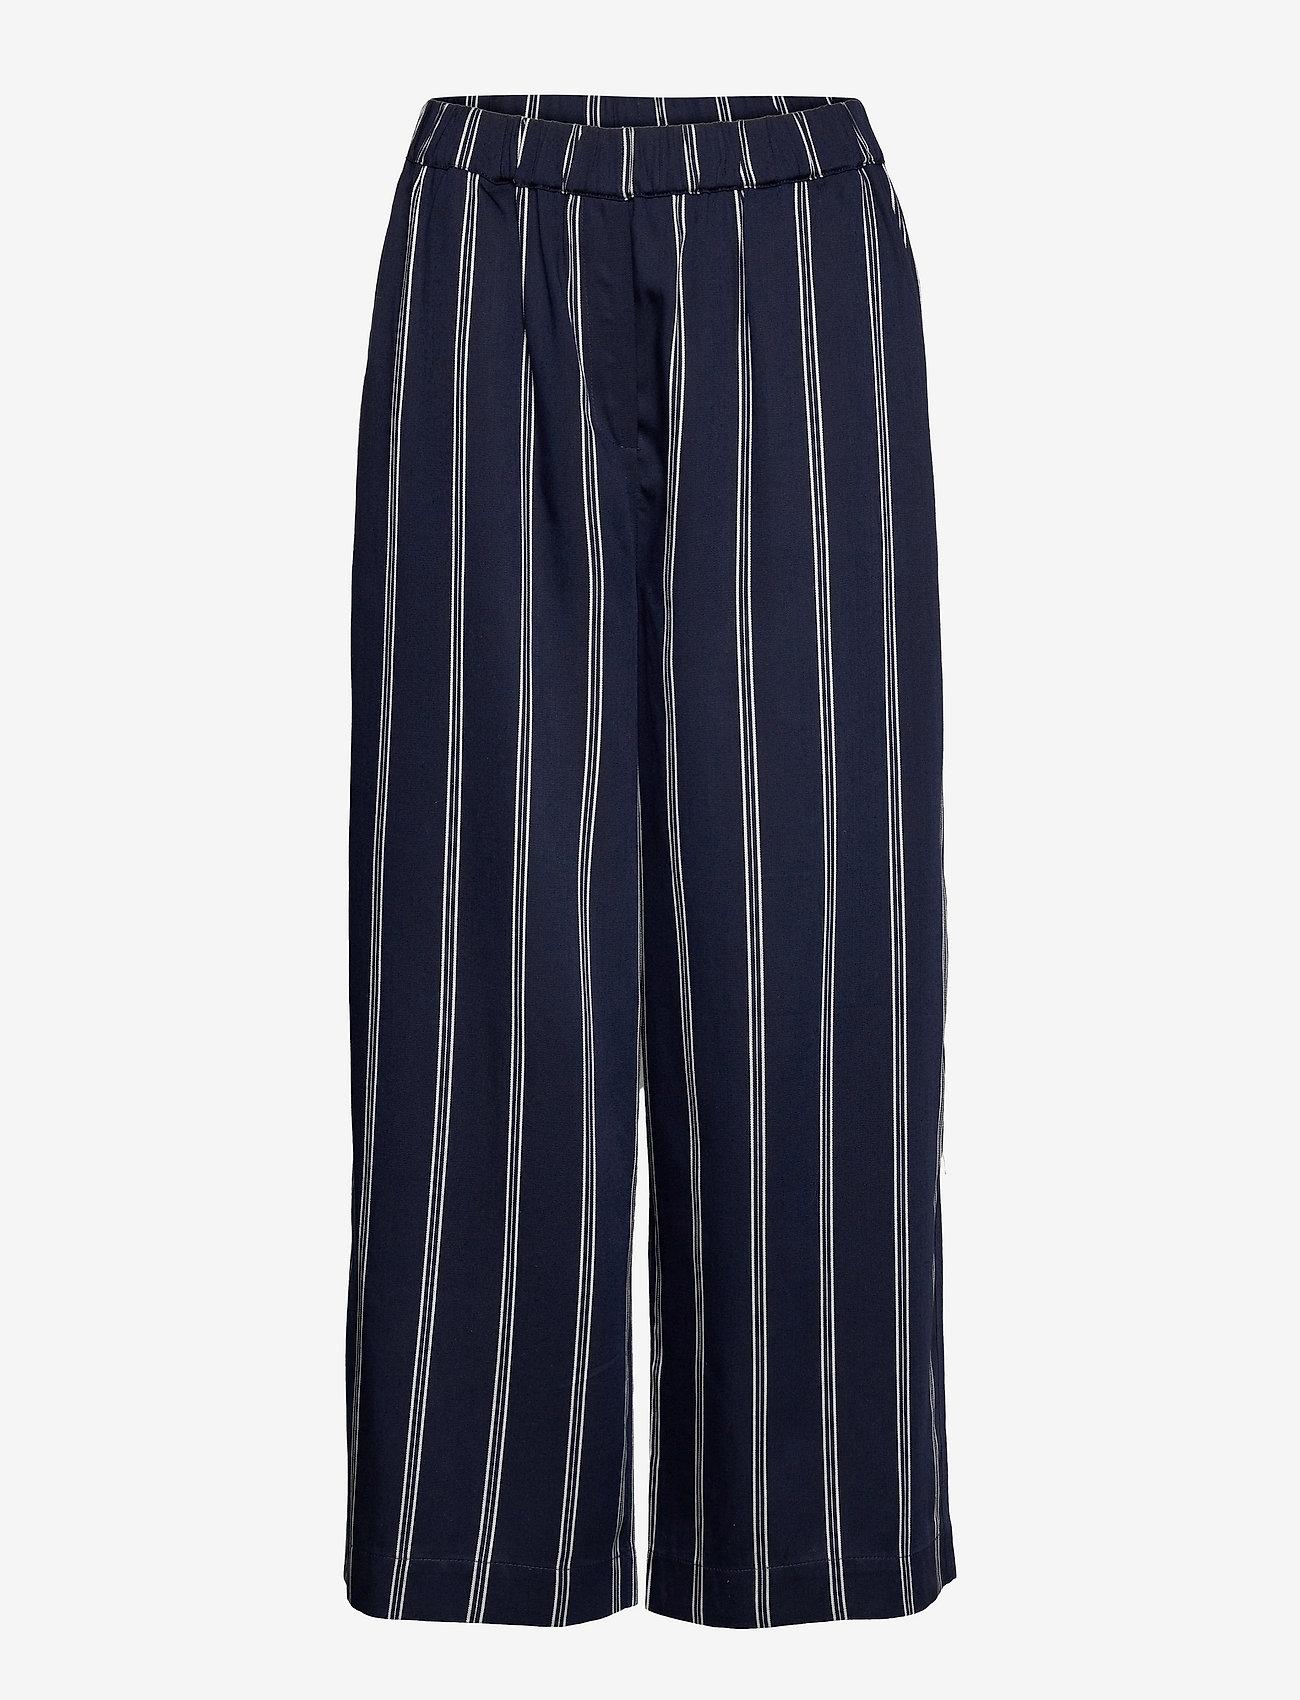 Masai - Pari - bukser med brede ben - navy - 0